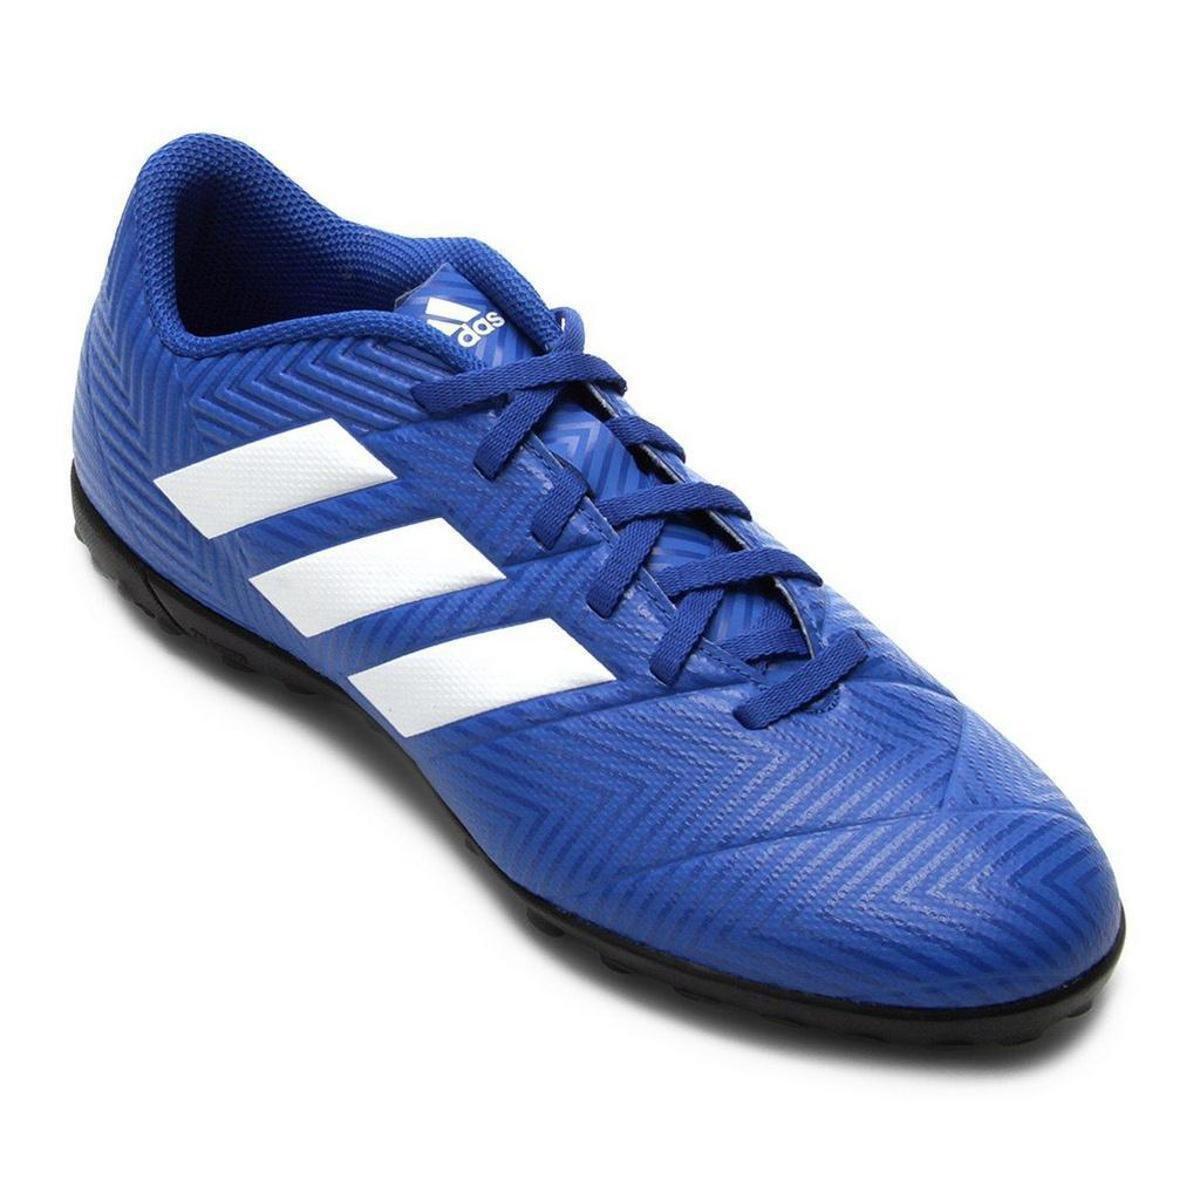 80ae6e835e Chuteira Society Adidas Nemeziz Tango 18 4 TF